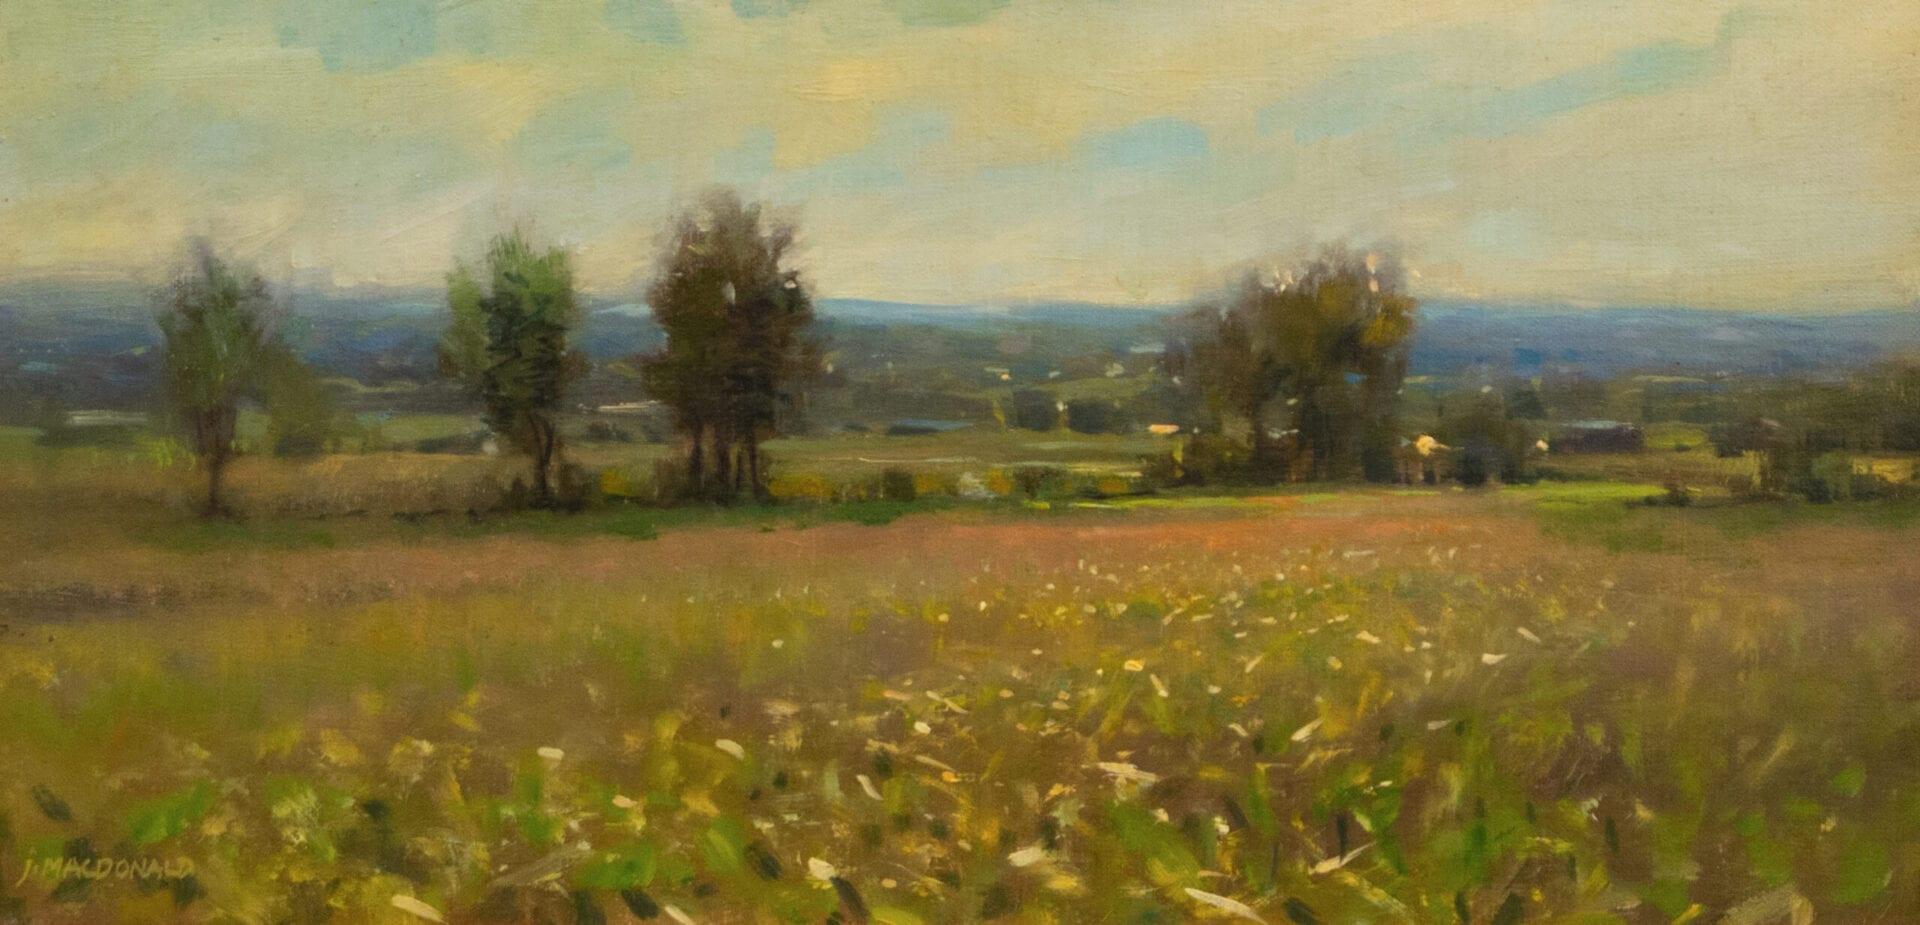 John MacDonald - Fields of July